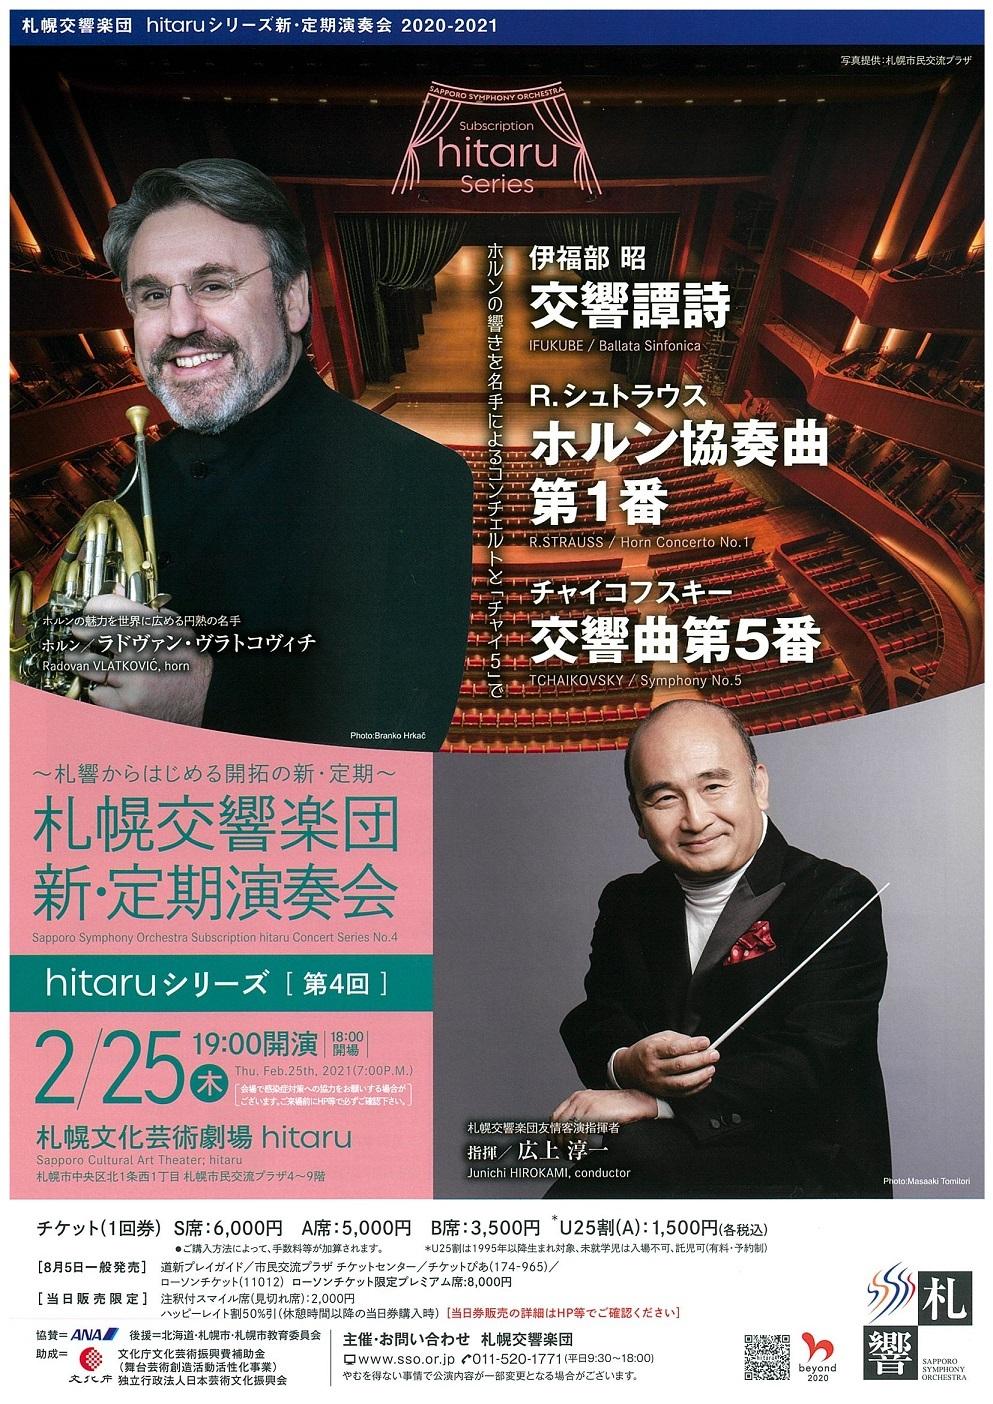 2/25 hitaruシリーズ新・定期演奏会 第4回の開催について